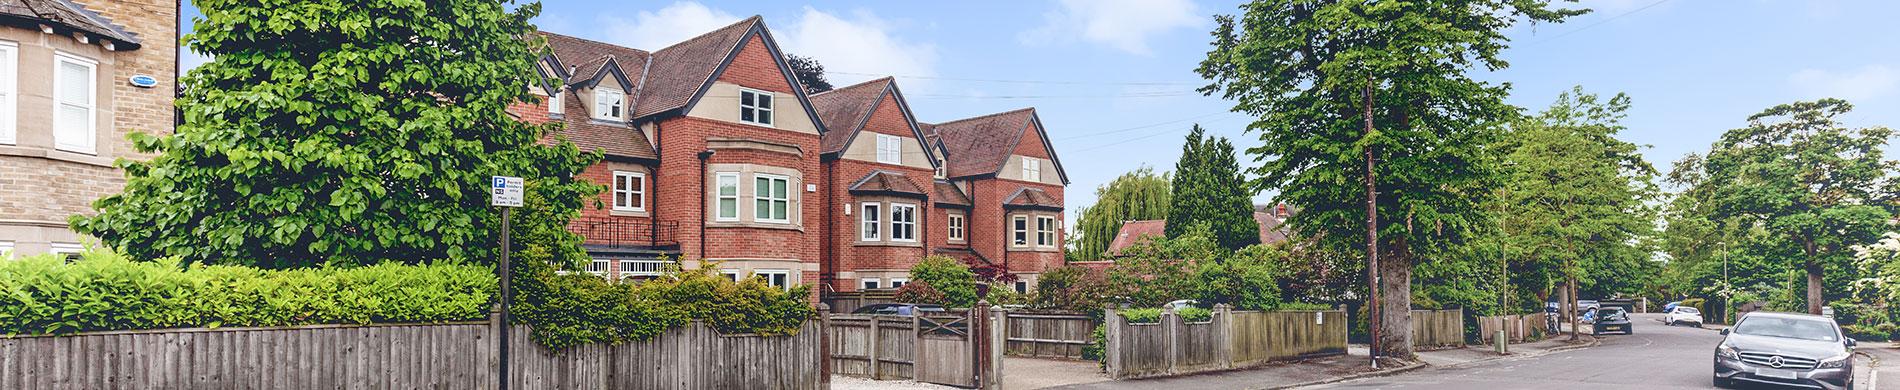 Bright Properties: Landlords